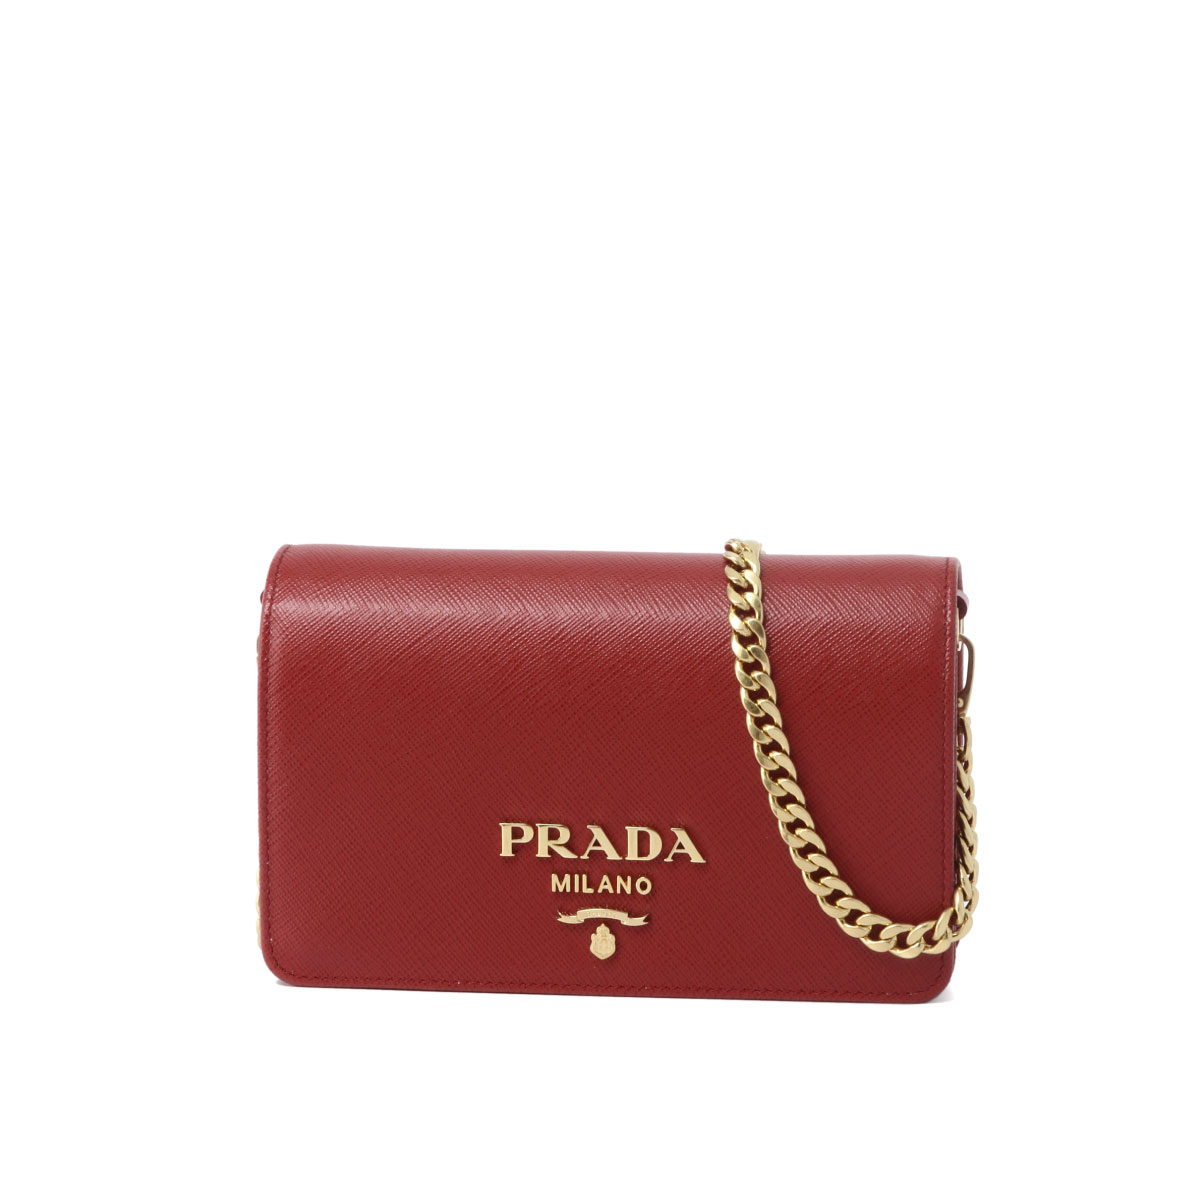 5ed7ae6d67 Prada PRADA bag lady 1BP006 NZV F068Z shoulder clutch bag FUOCO red  belonging to